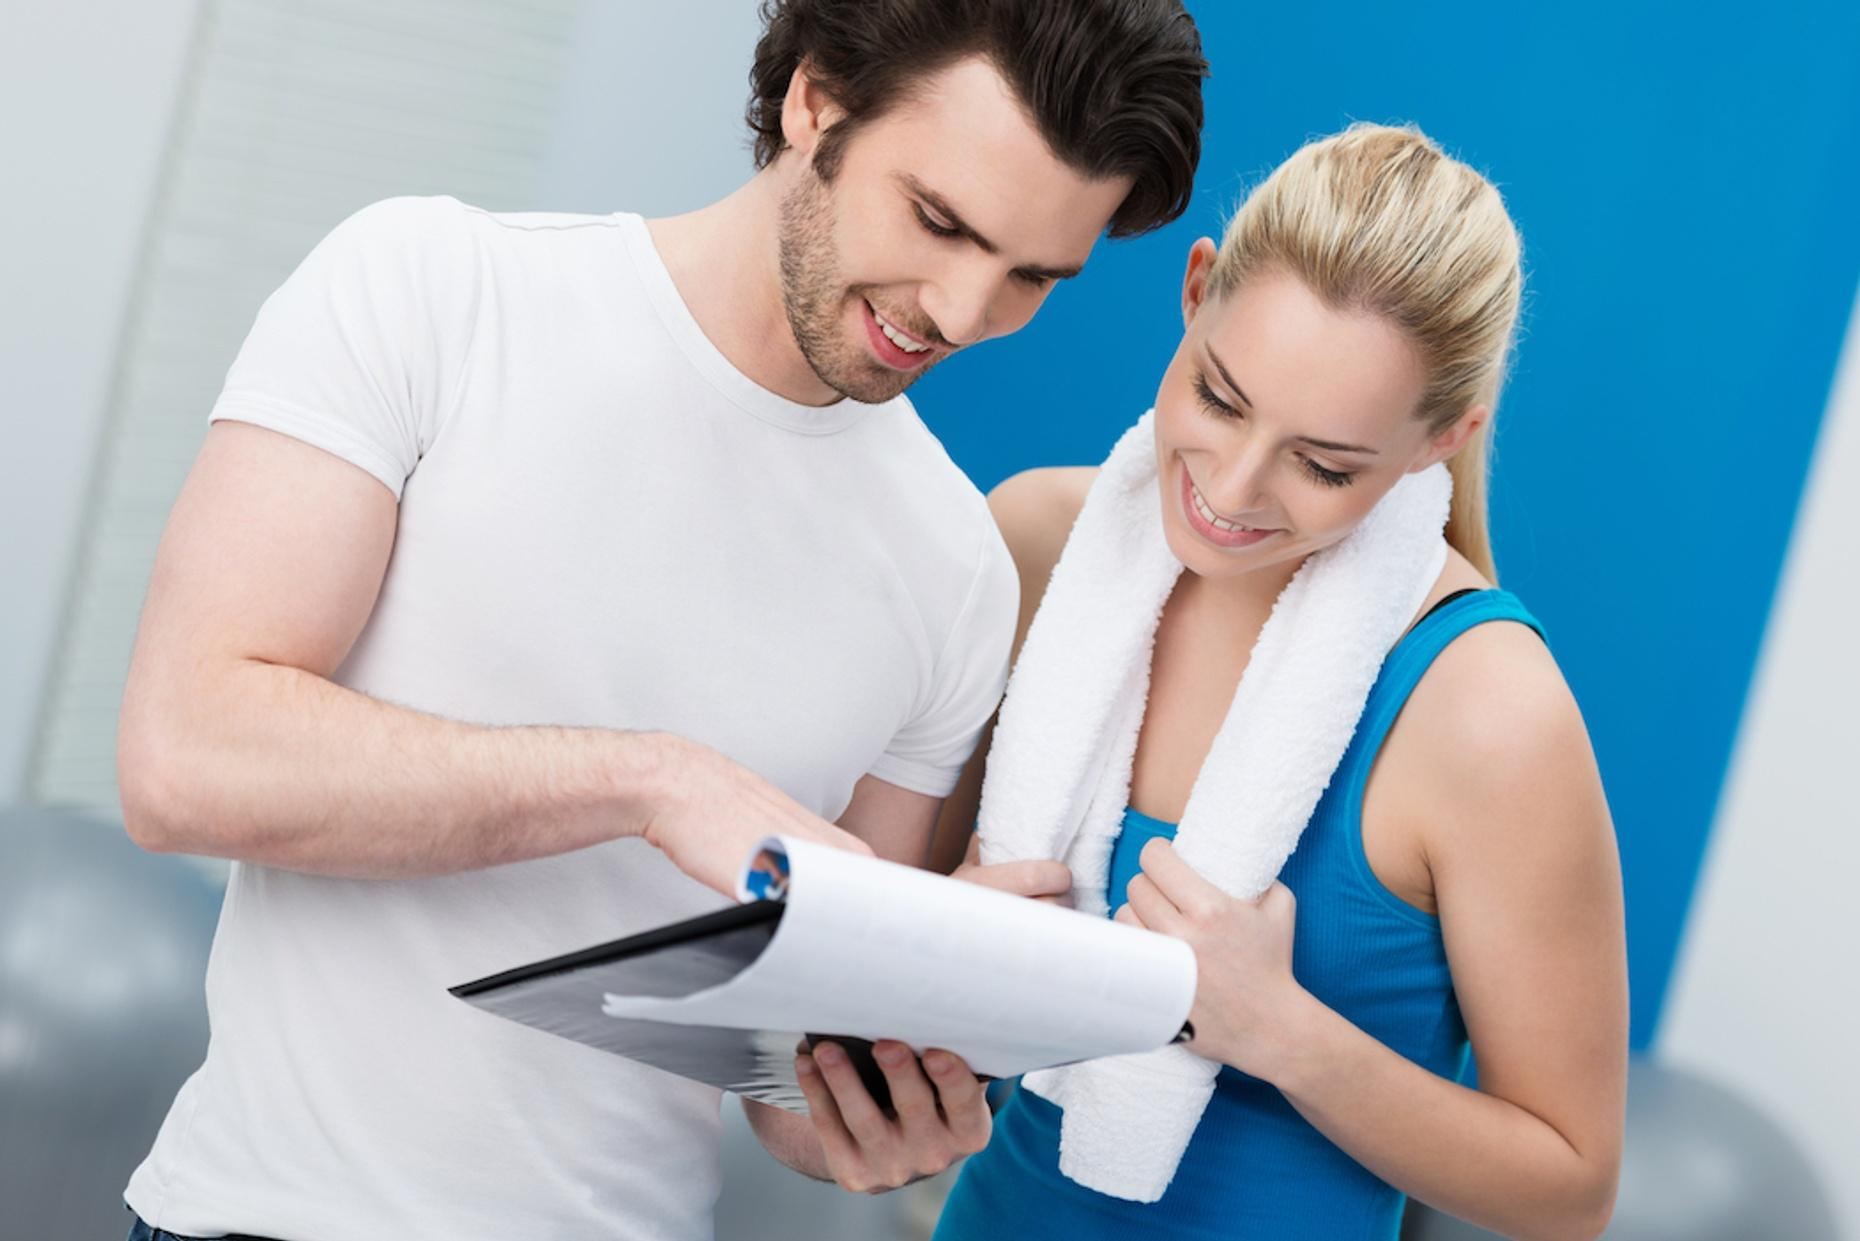 Fitness & Body Composition Testing in Atlanta